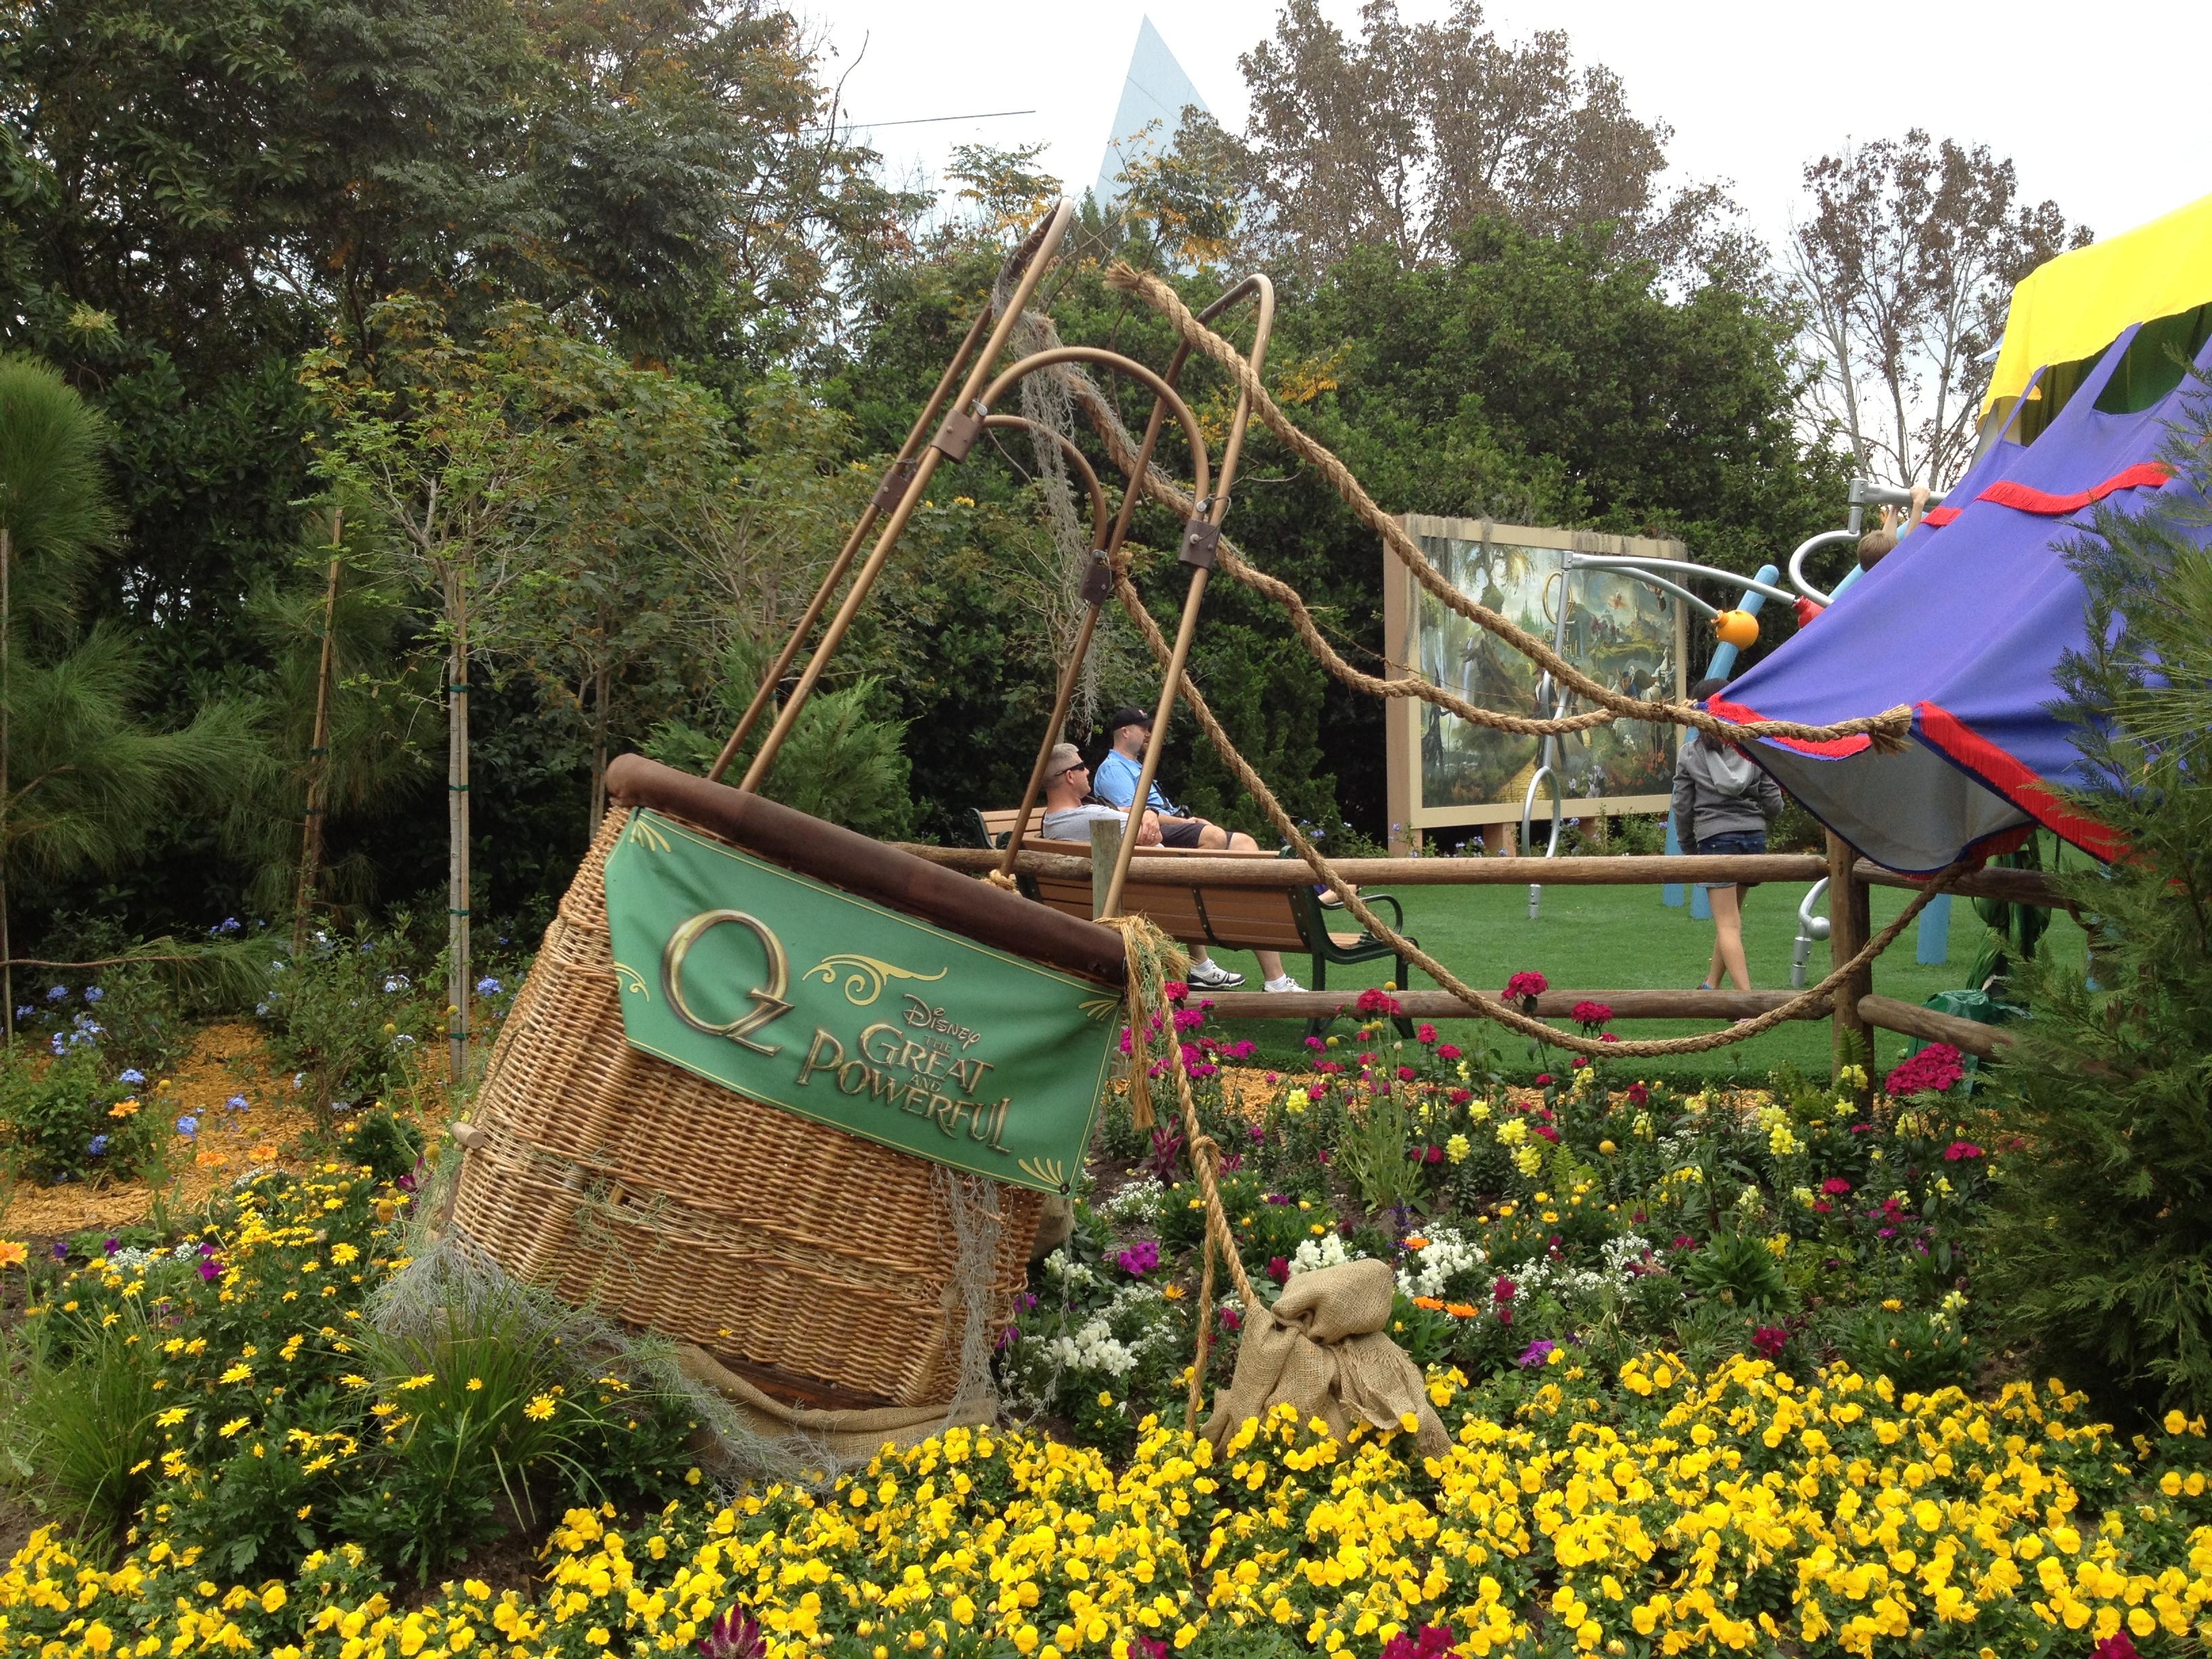 File:Epcot\'s Oz Garden and play area (8550988135).jpg - Wikimedia ...